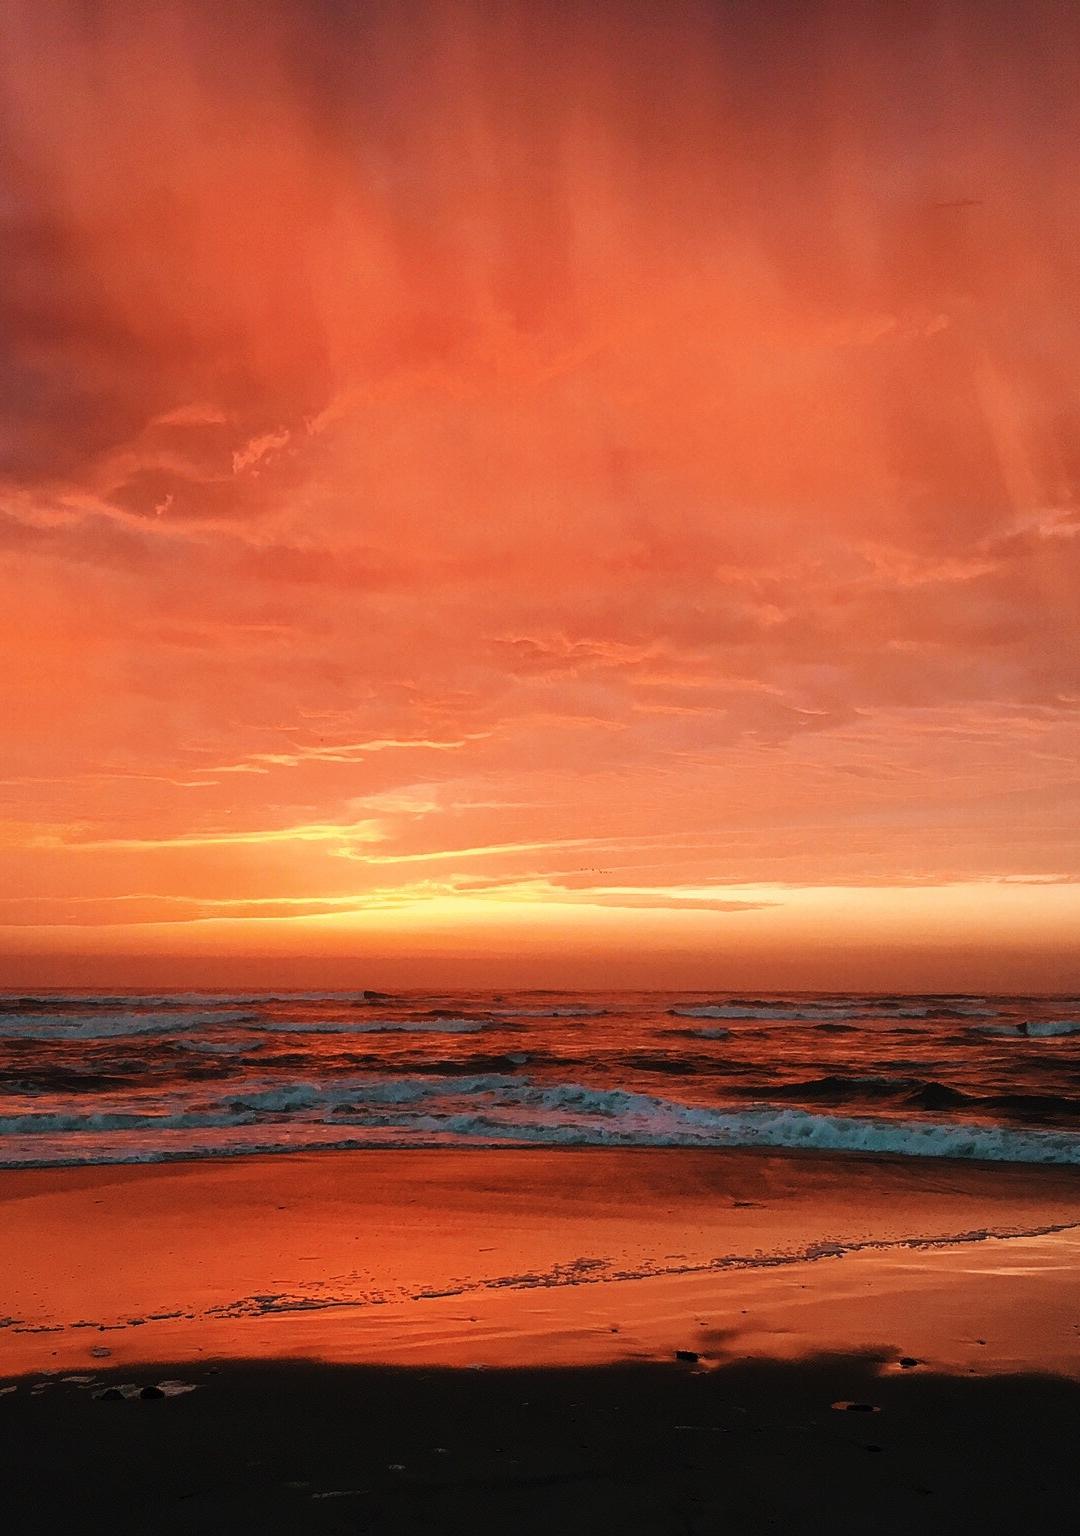 Sunrise HD iPhone Wallpaper   iDrop News